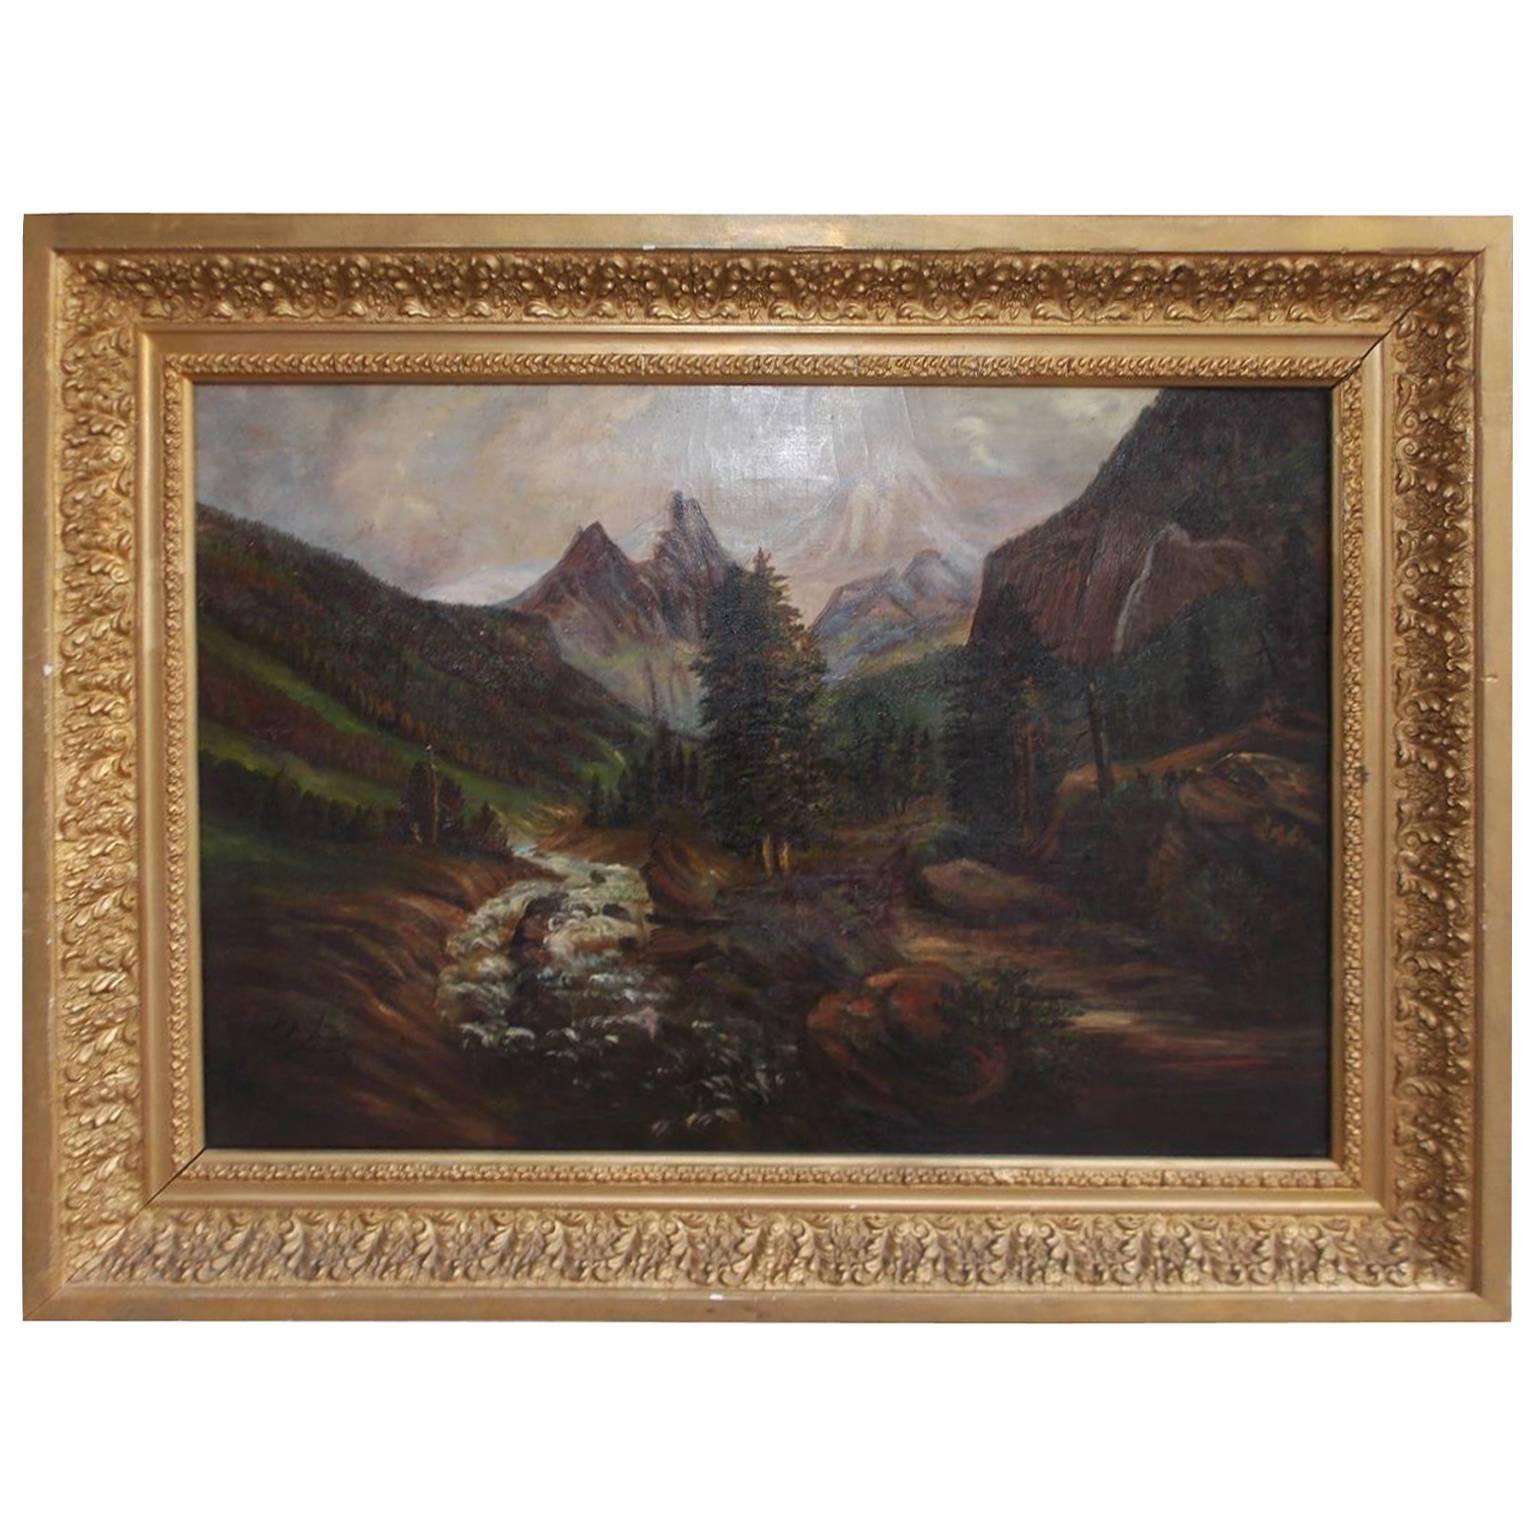 American Oil on Canvas of Landscape in Original Gilt Frame, Circa 1870